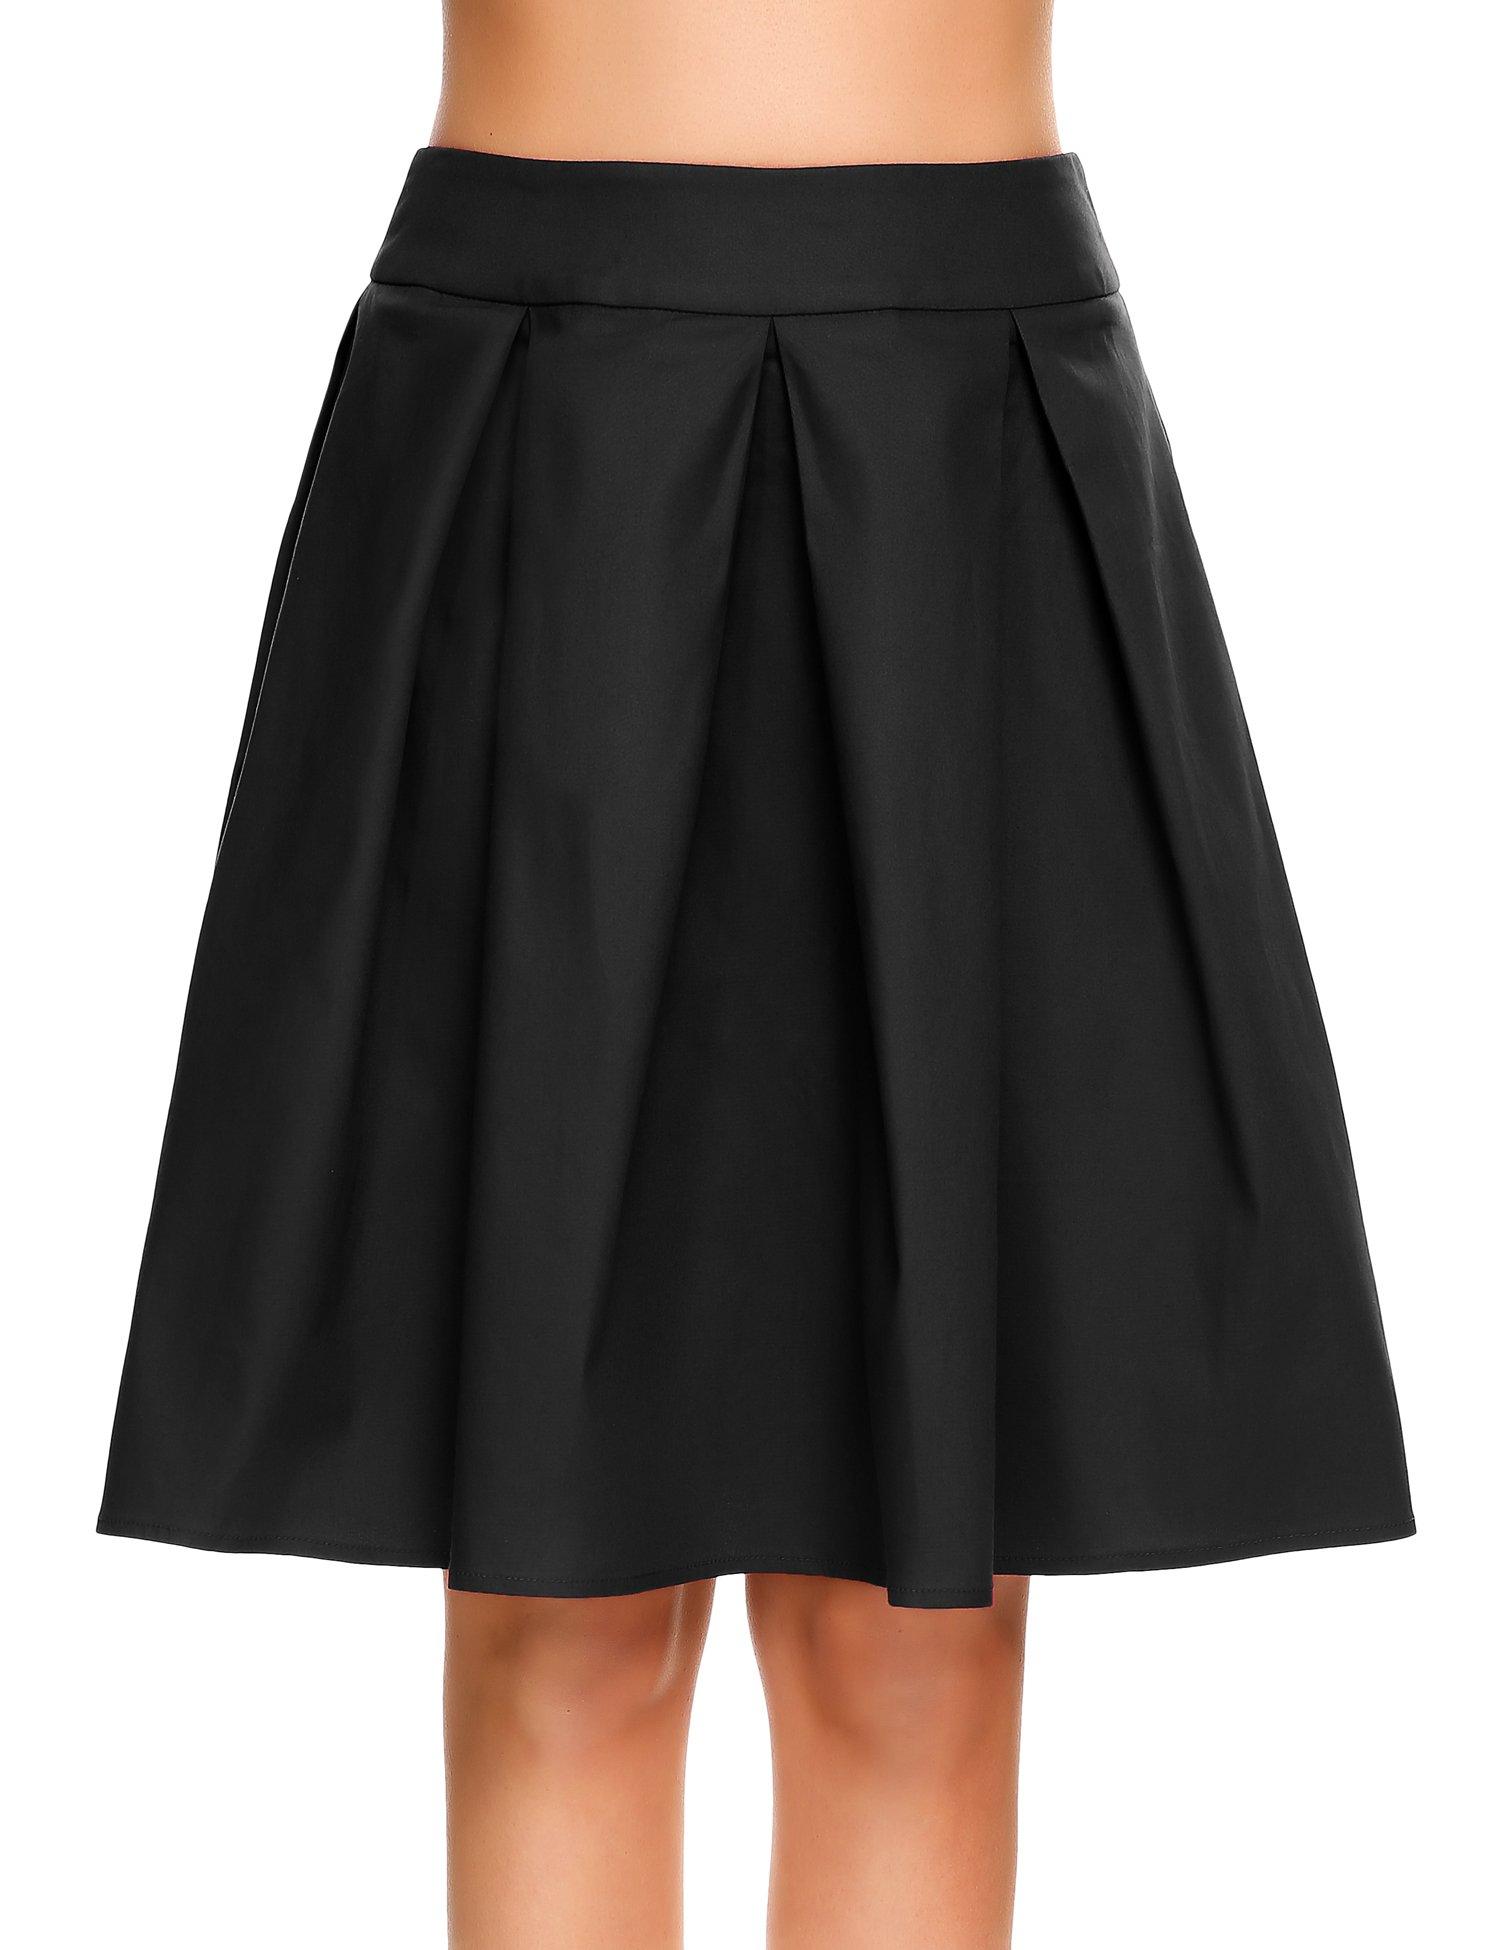 Zeagoo Women's New Vintage Style High Waist A-line Skirt Casual Party Beach Midi Skirt Black X-Large